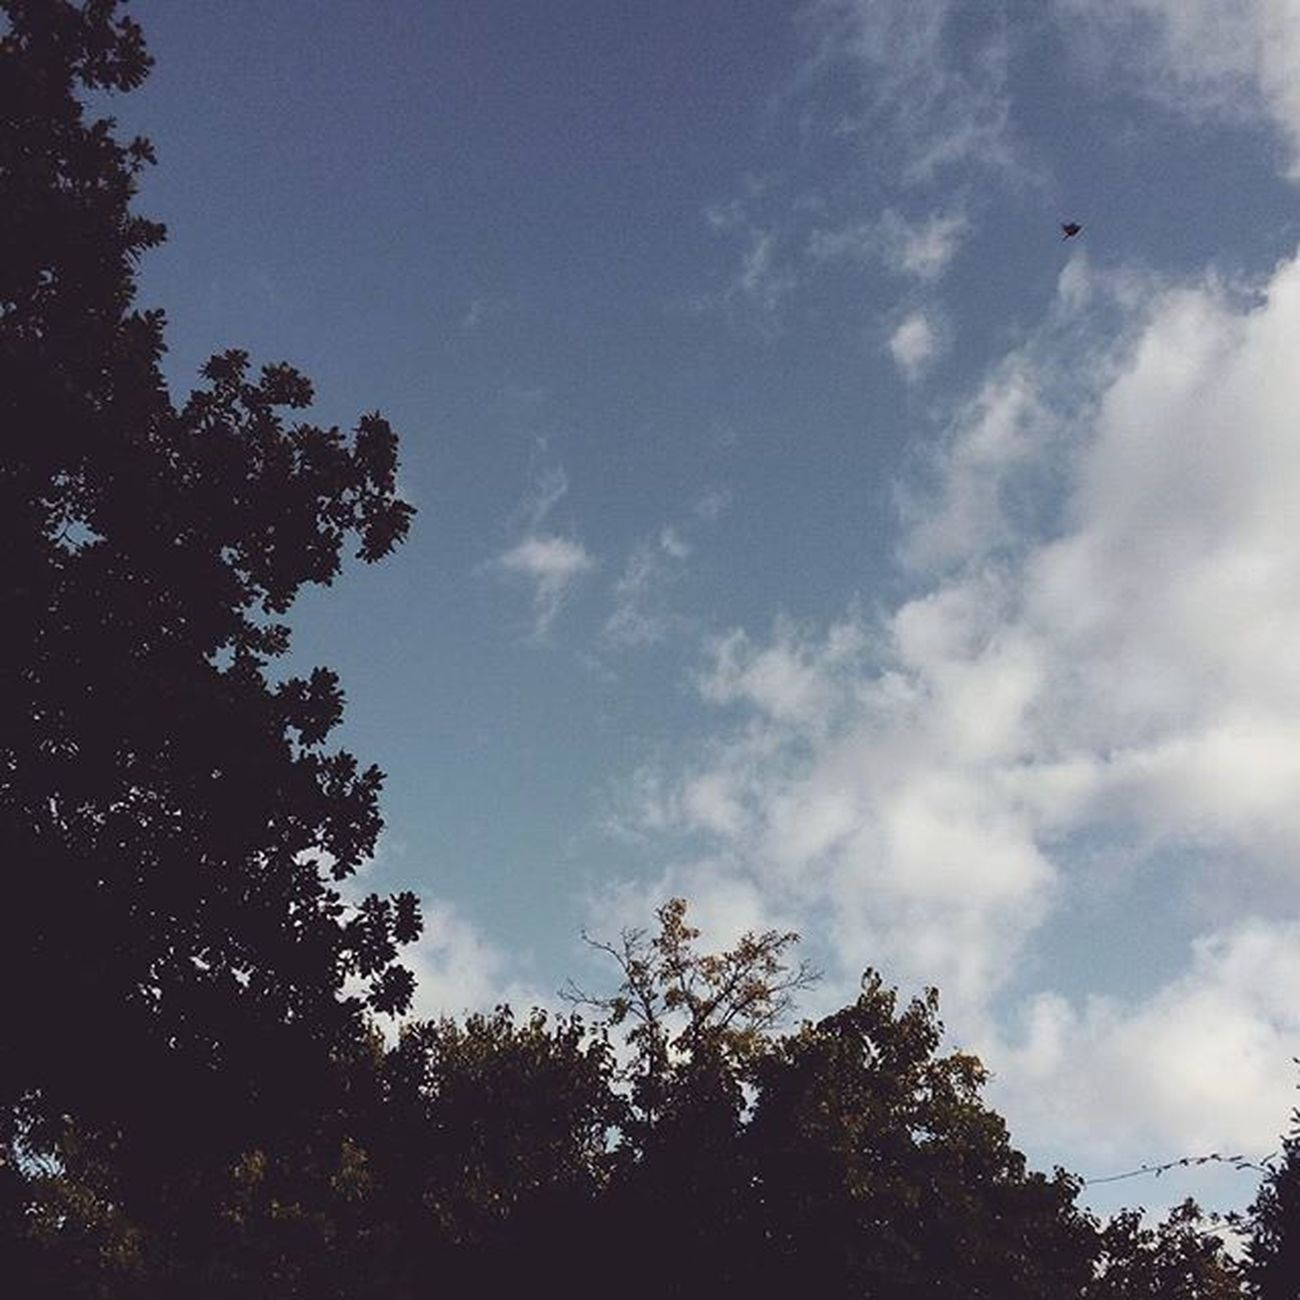 domenica ☀ Domenica Sunday Trees Leaf Leaves Sky SkyClouds Skylovers Nuvoleblurassegnati Clouds Cloudslovers Cloudscape Marche Italia Italy Igersmarche Igersitalia Liveloveitaly Cielo Cieloazzurro Autumn Autunno  Lategram Nature Naturelovers landscape